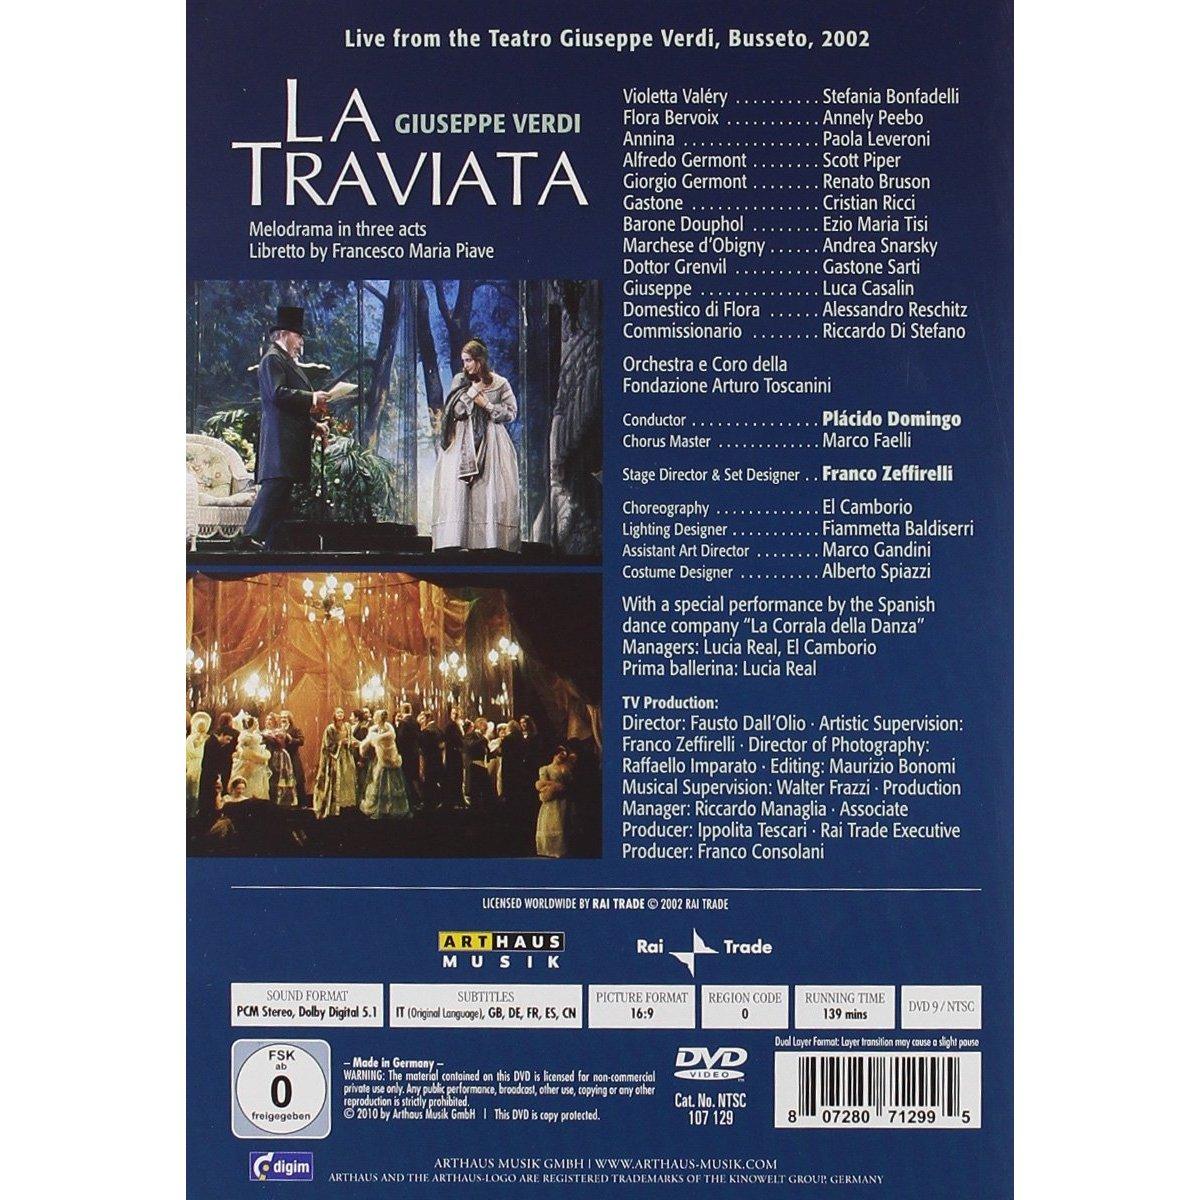 2 Traviata in teatro Busetto Zefirelli 81lOgCLzv+L._AA1200_